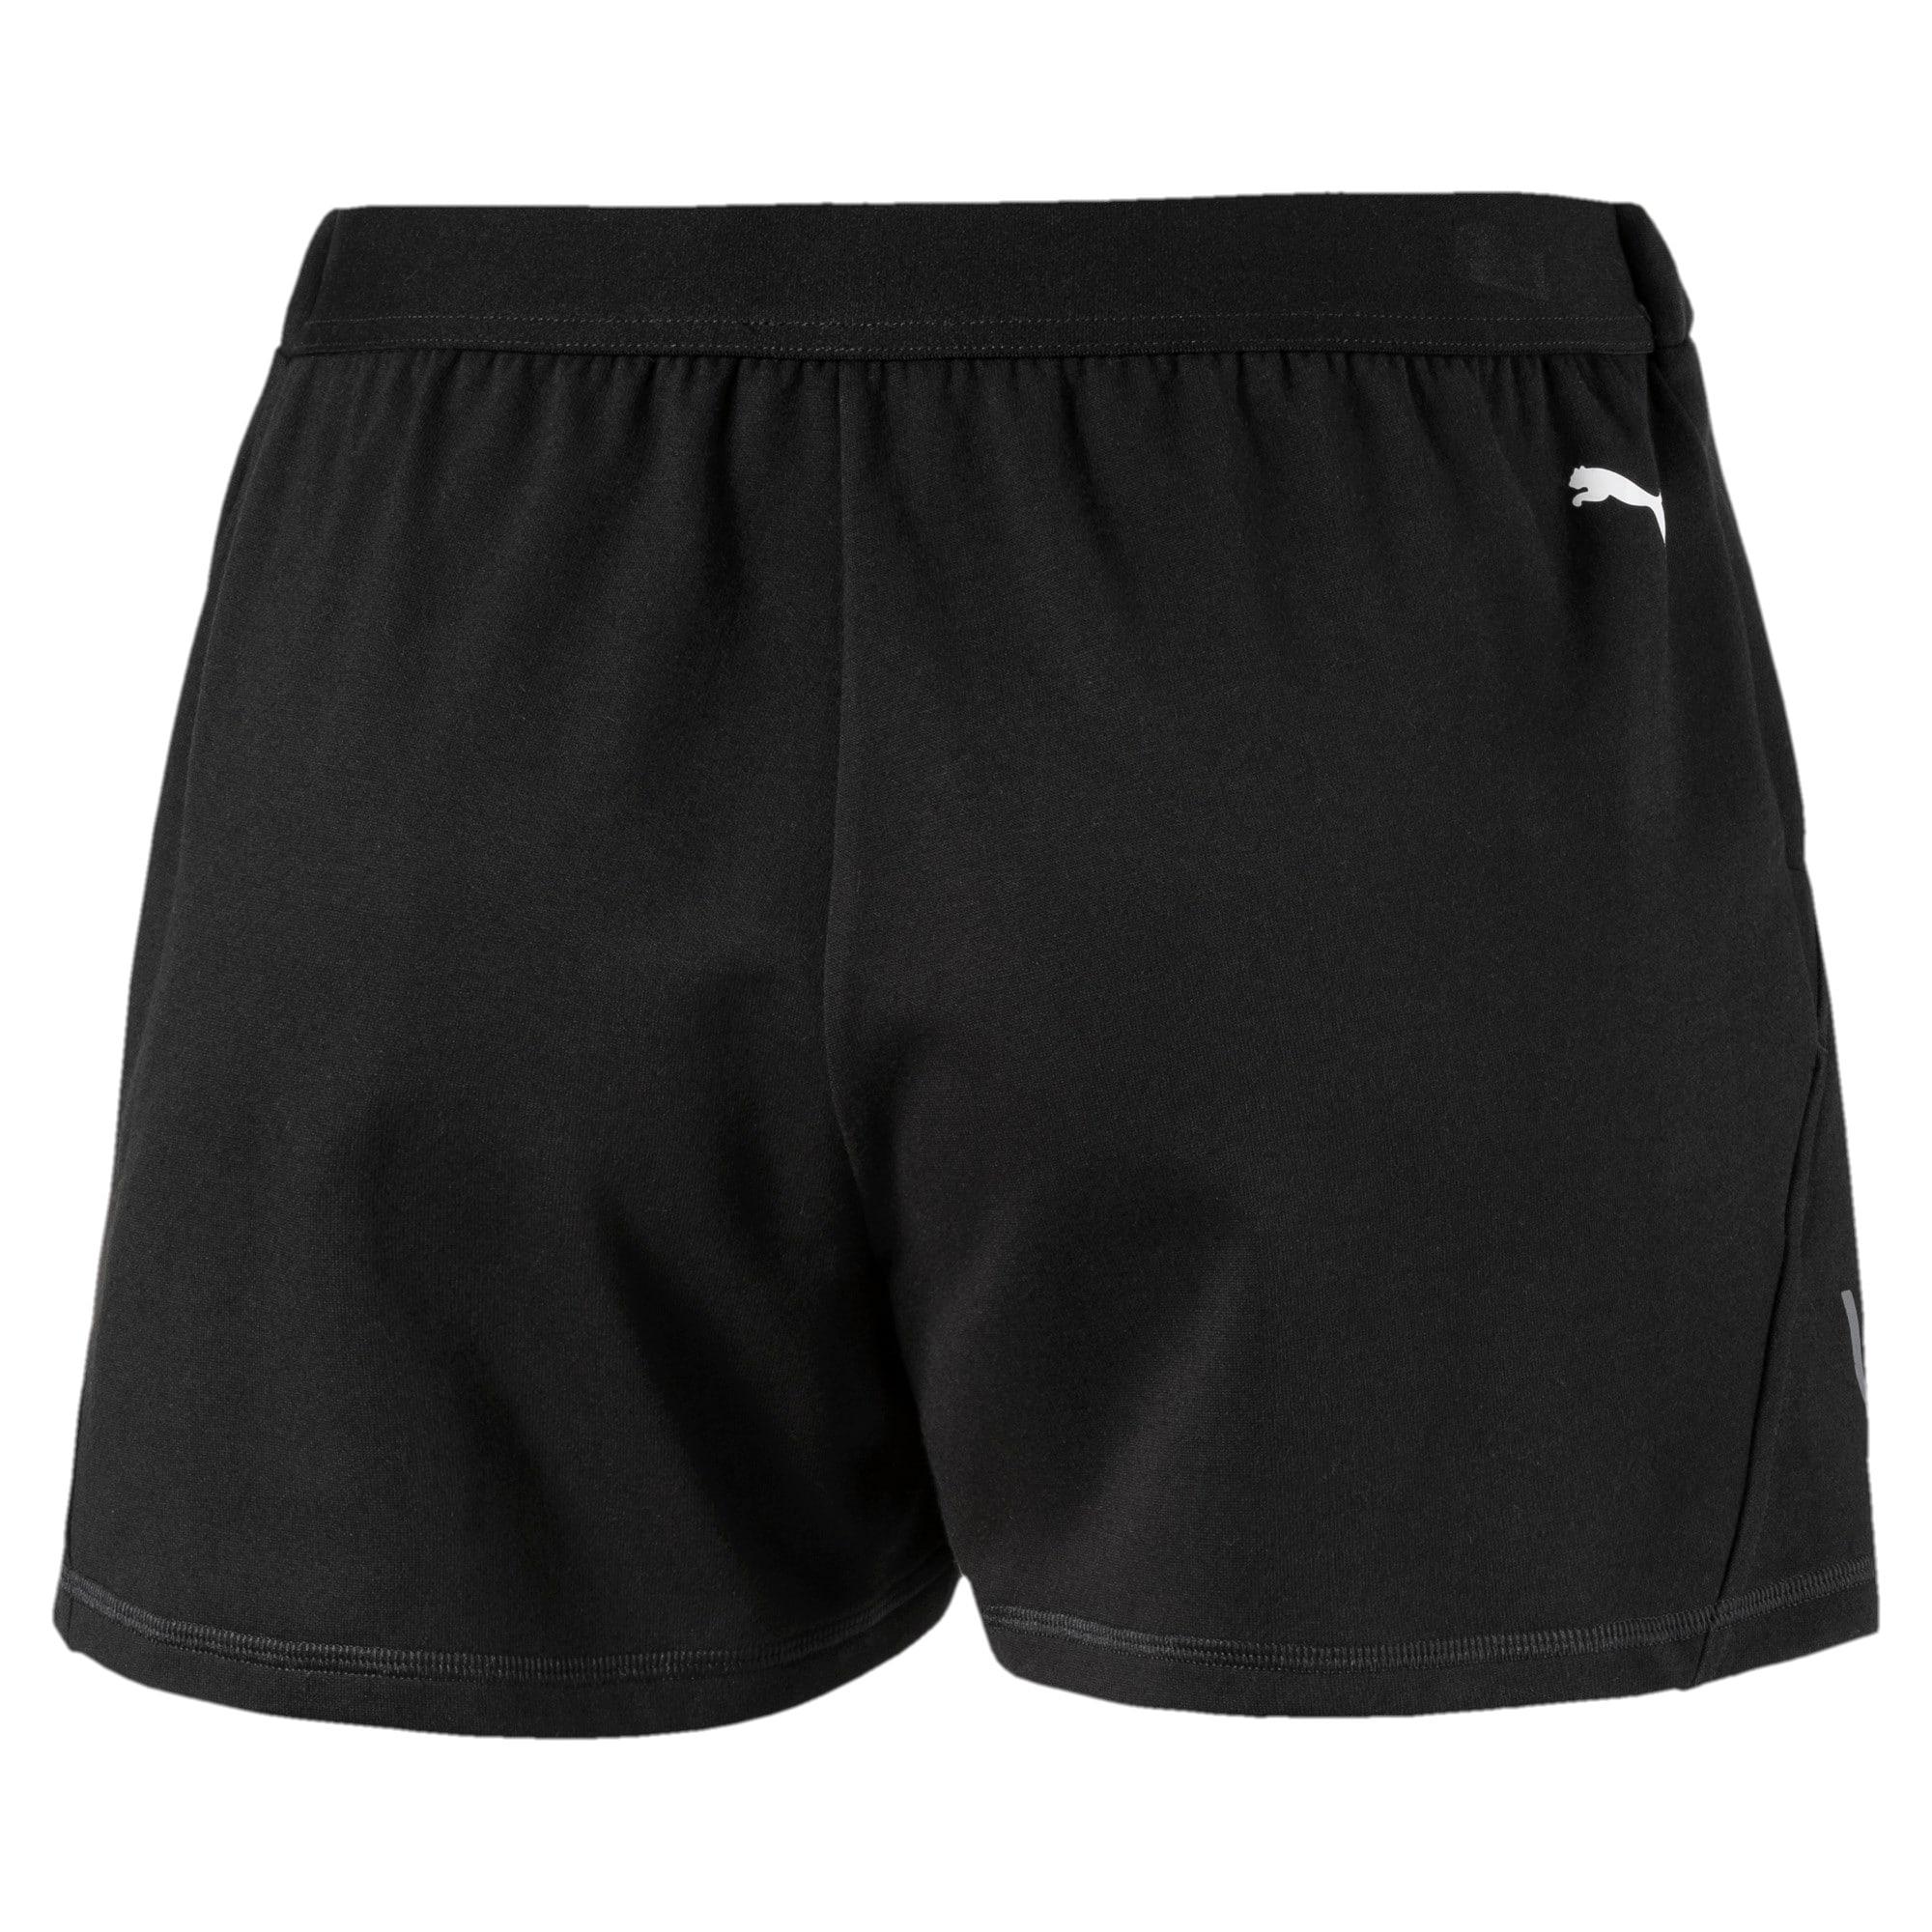 Miniatura 5 de Shorts HIT Feel It para mujer, Puma Black, mediano